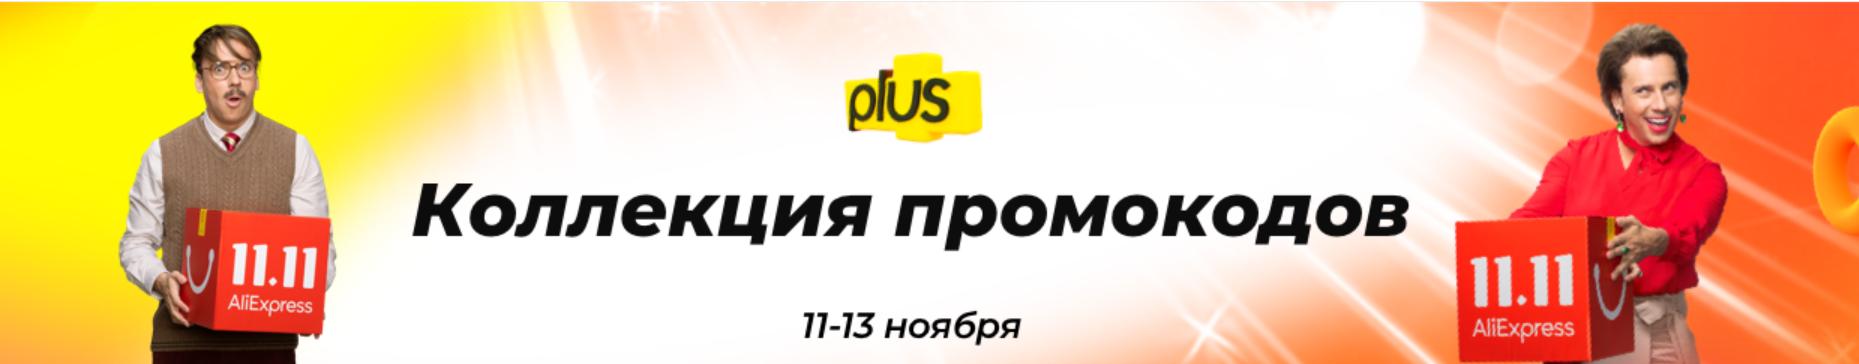 алиэкспресс11.11